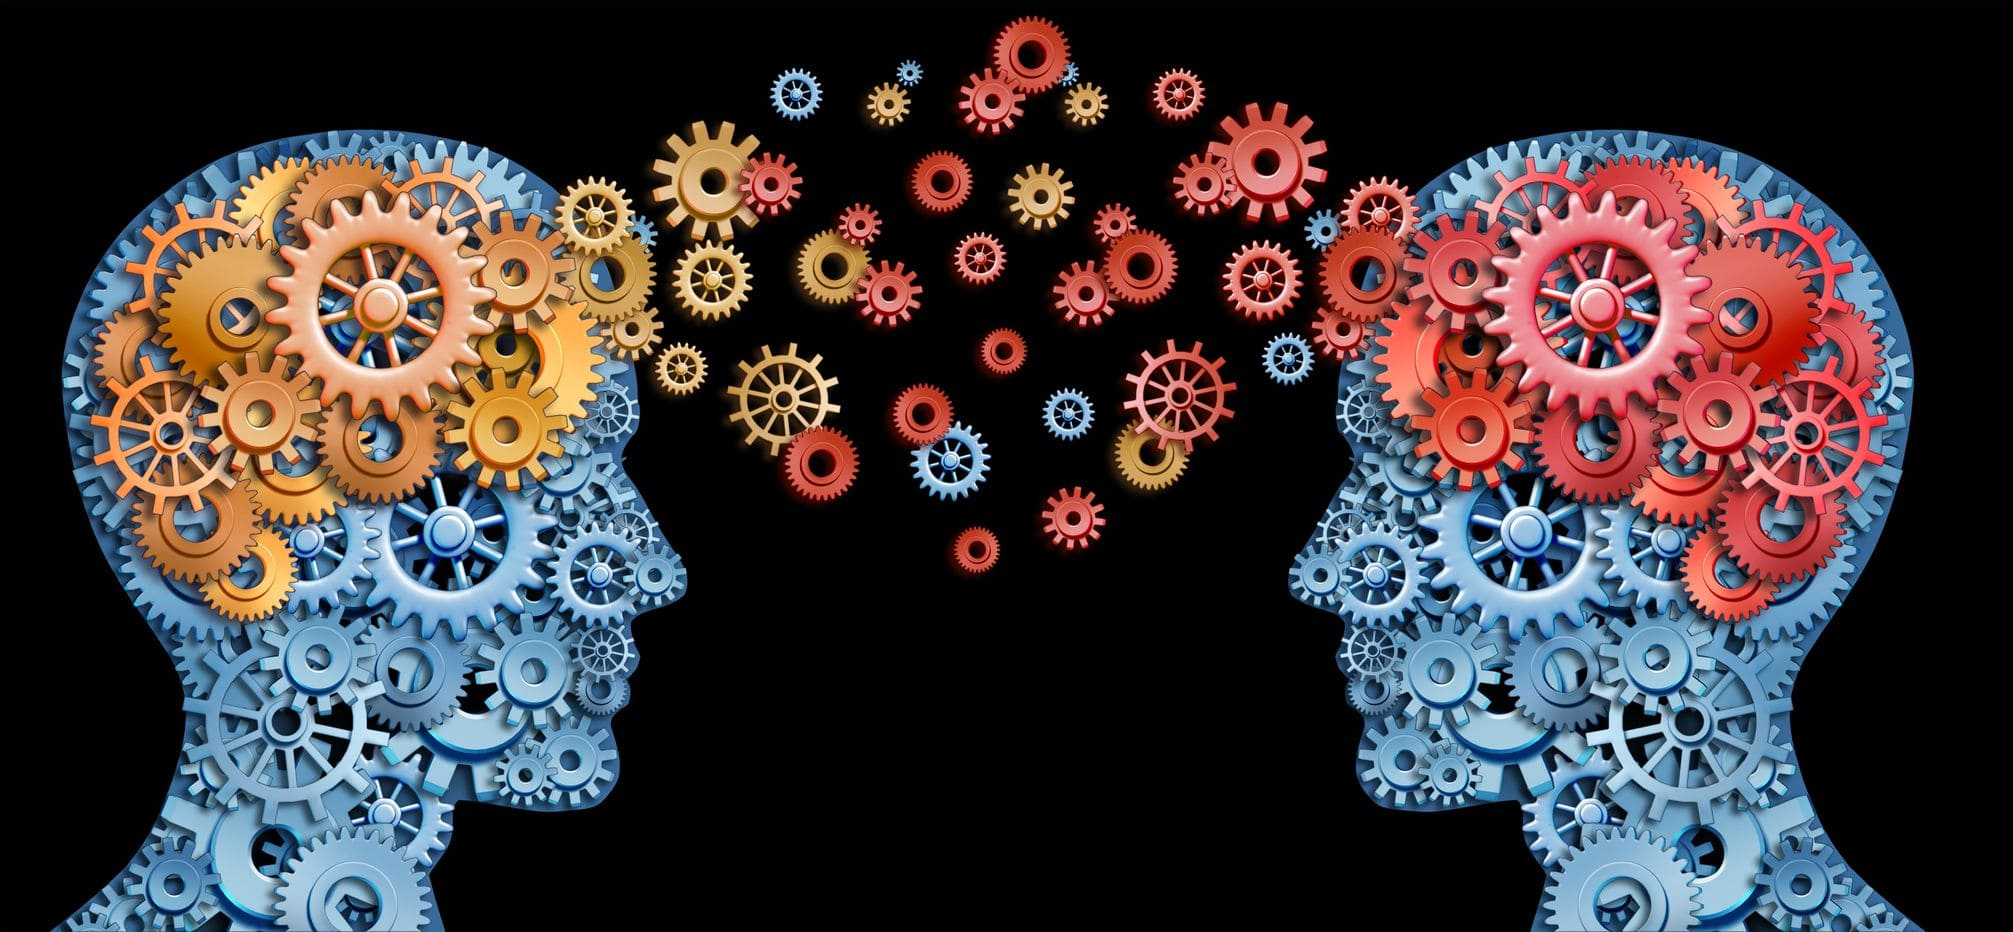 dicas de mindset interagir